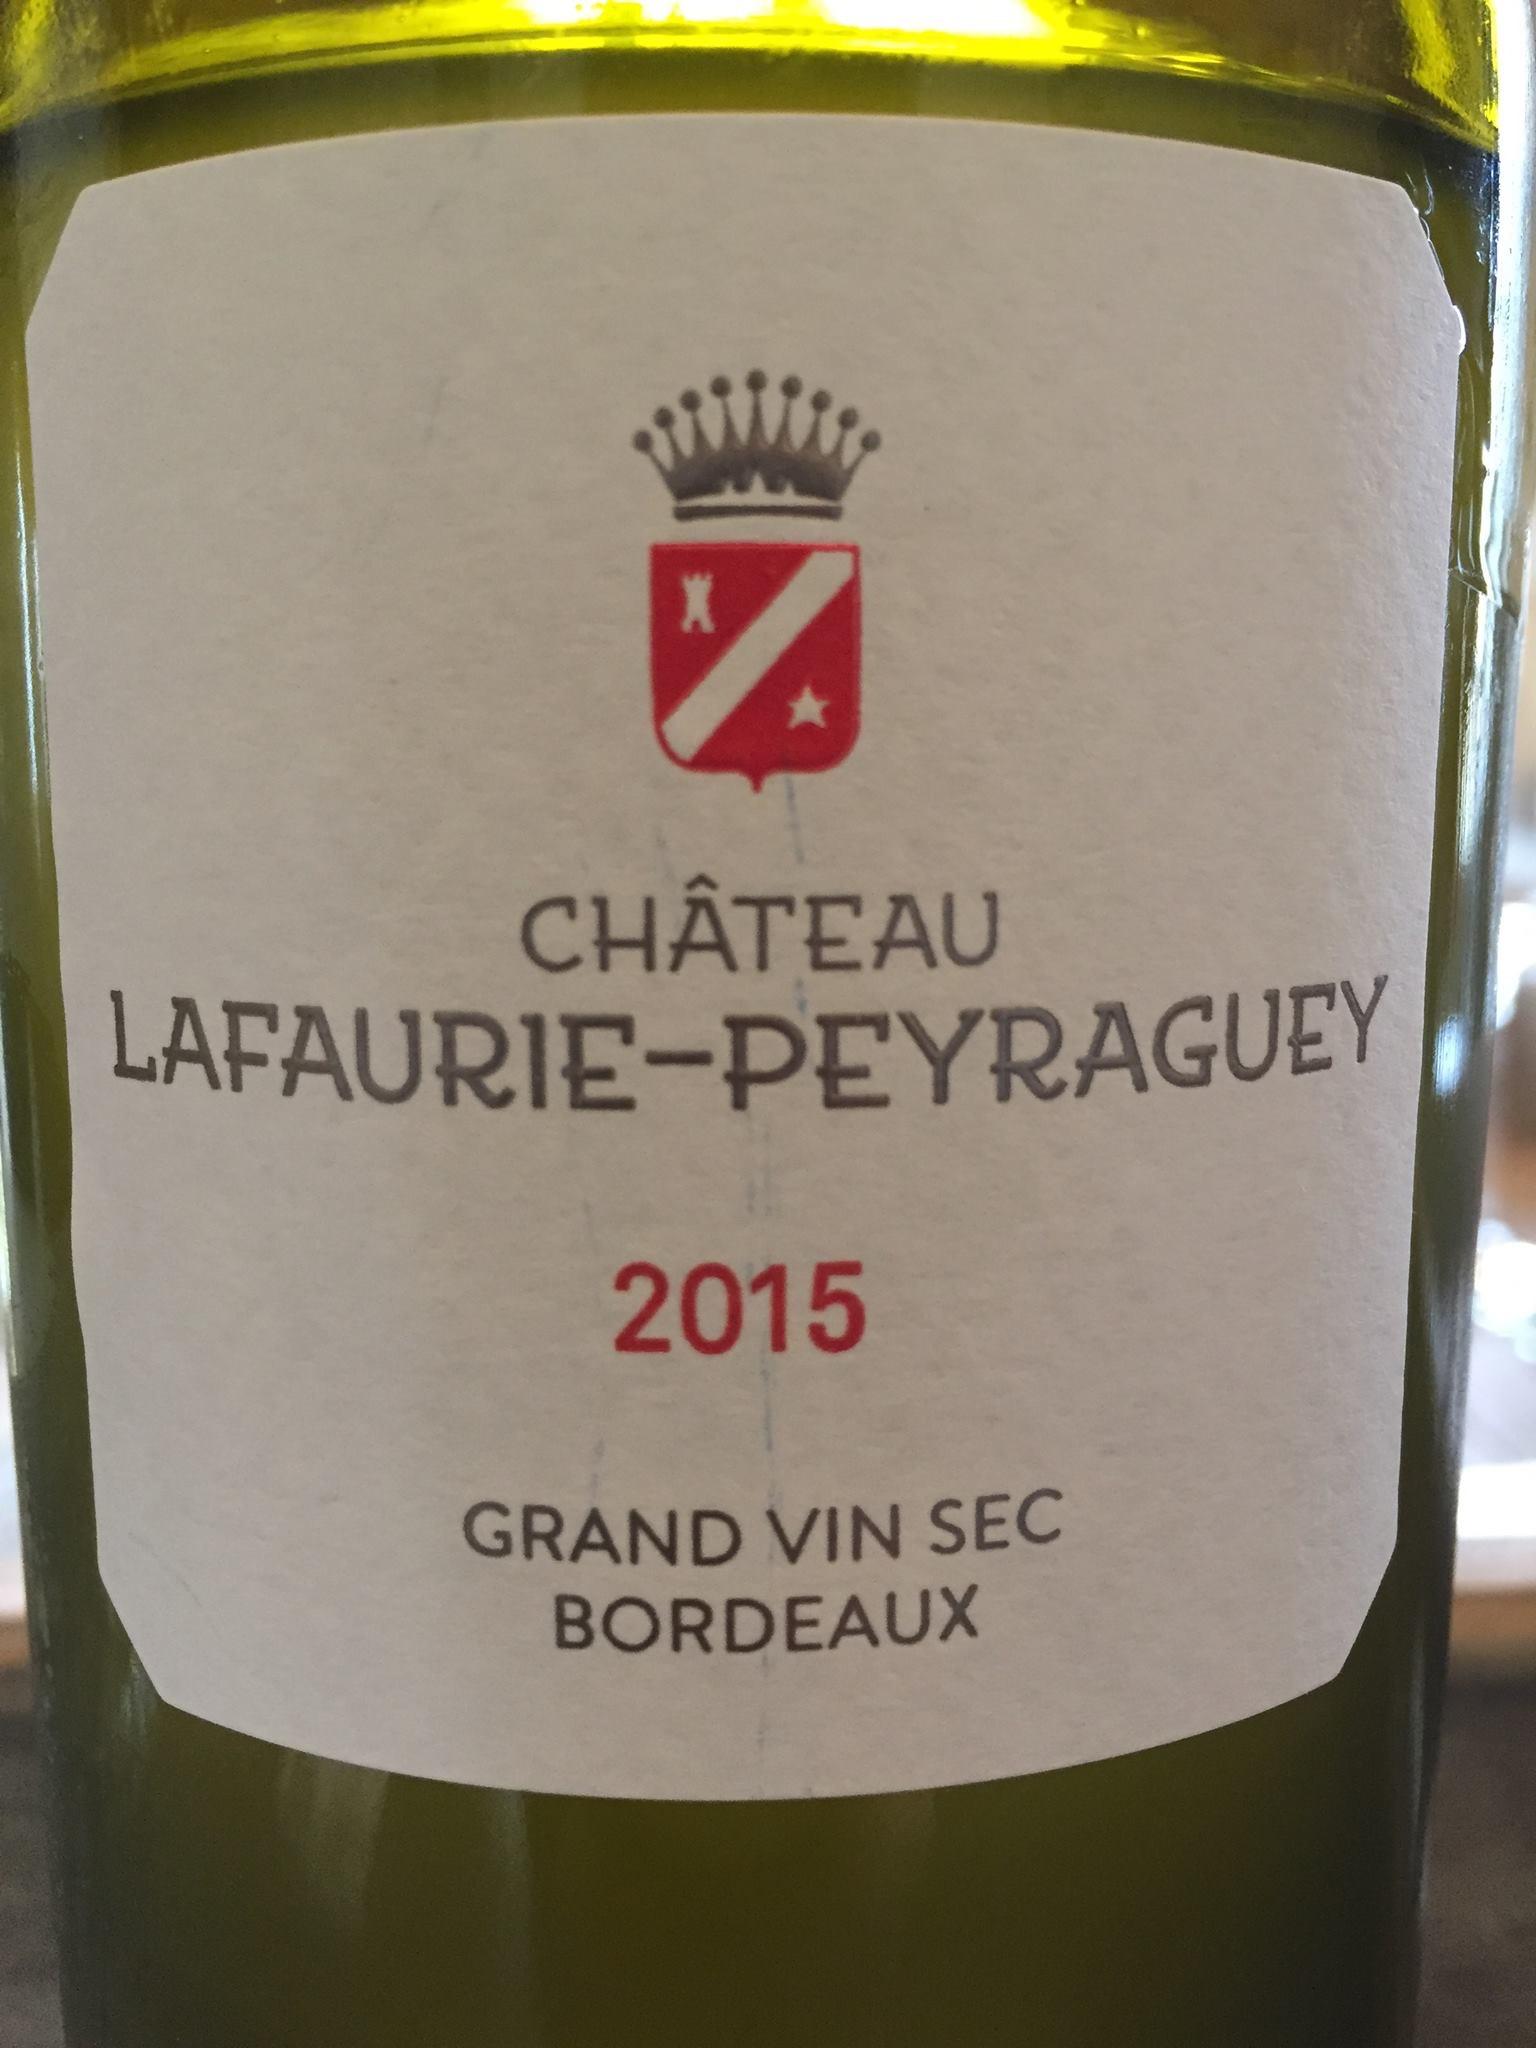 Château Lafaurie-Peyraguey 2015 – Bordeaux